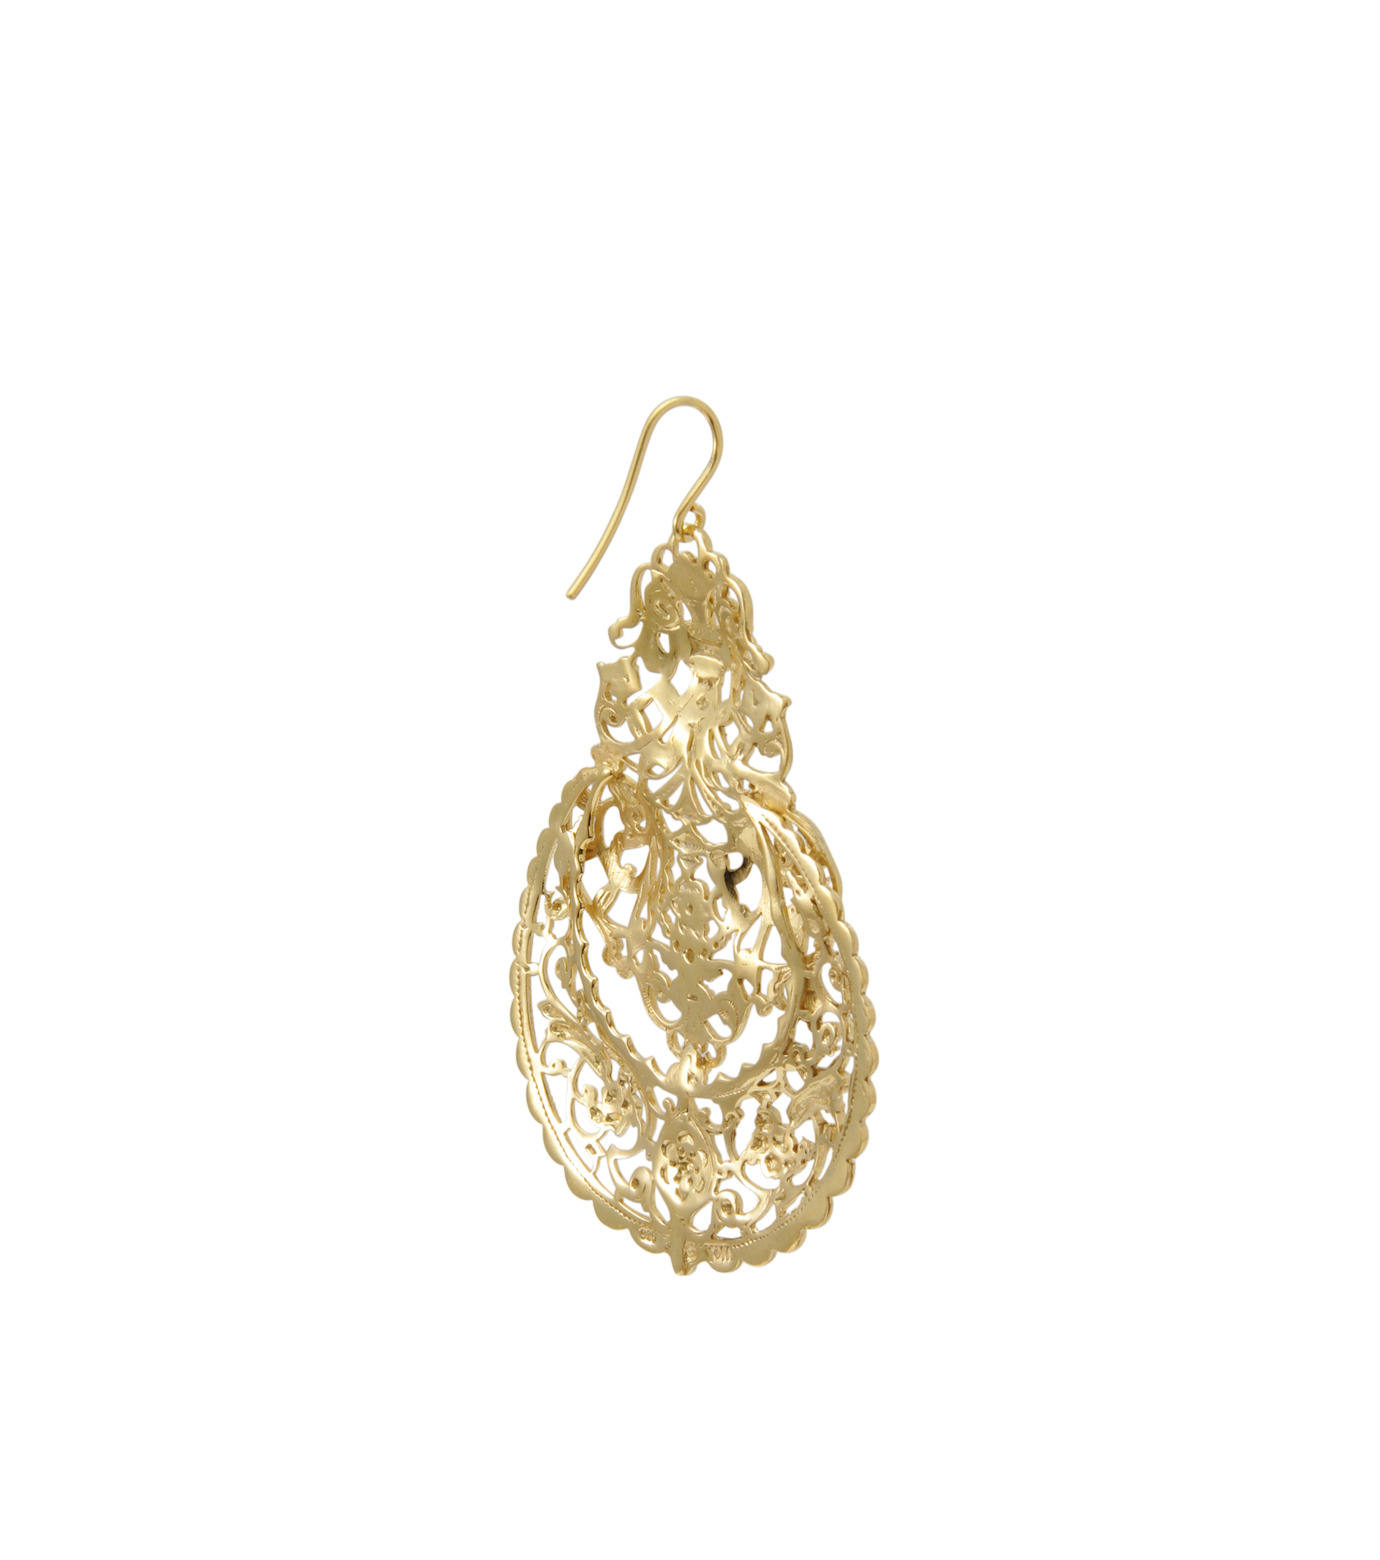 I AM by Ileana Makri(アイ アム バイ イリーナ マクリ)のAntoinette Earrings-GOLD-O489-42-099-2 拡大詳細画像3